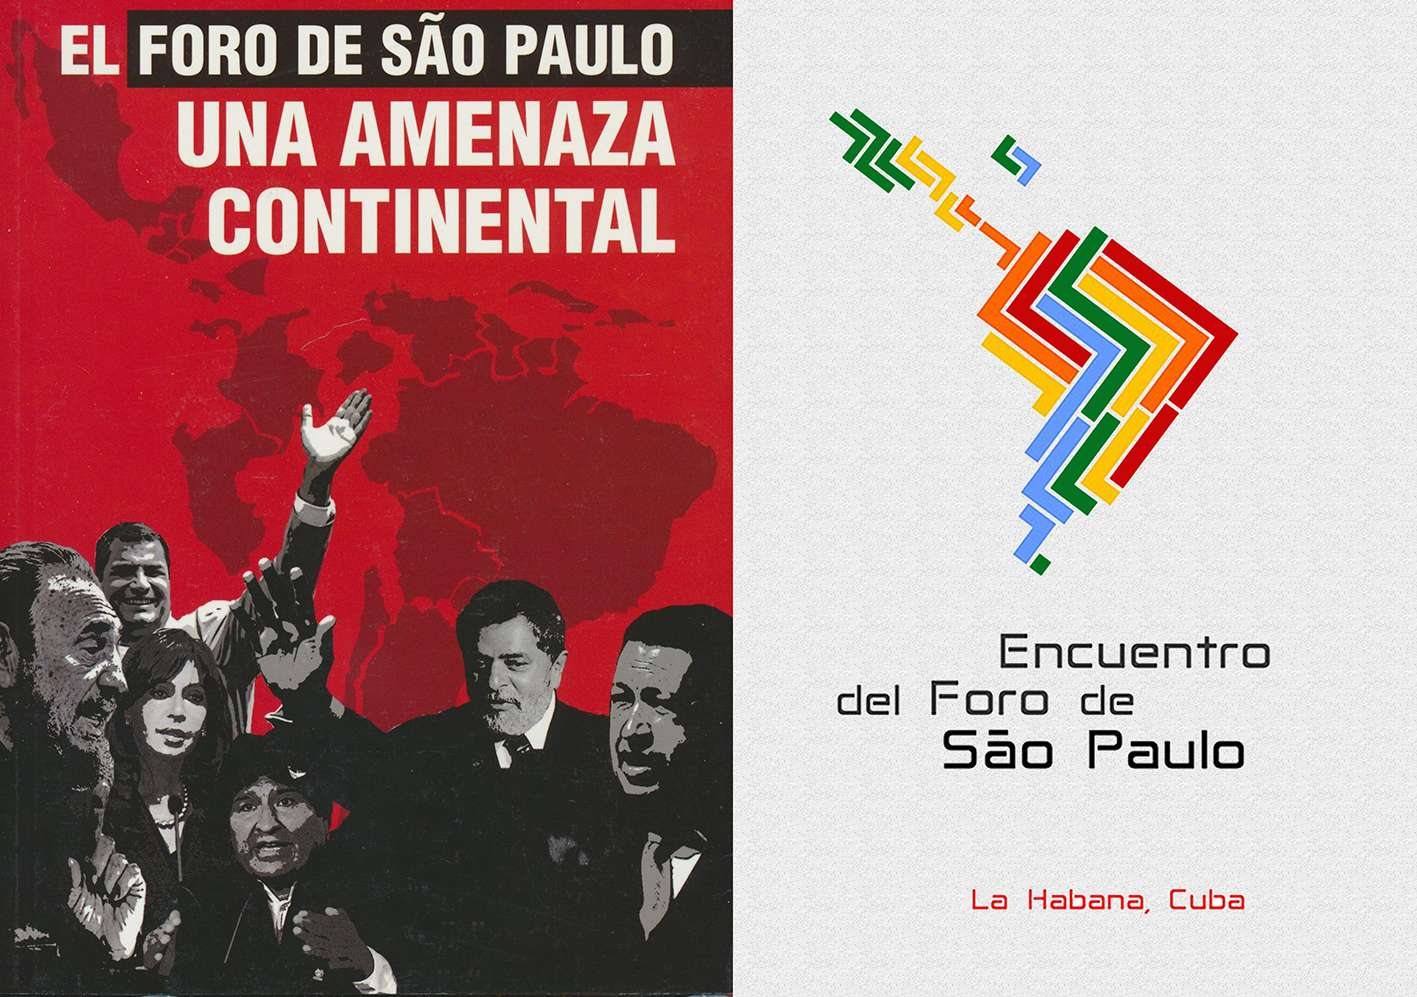 Foro de São Paulo Miguel Díaz-Canel Bermúdez